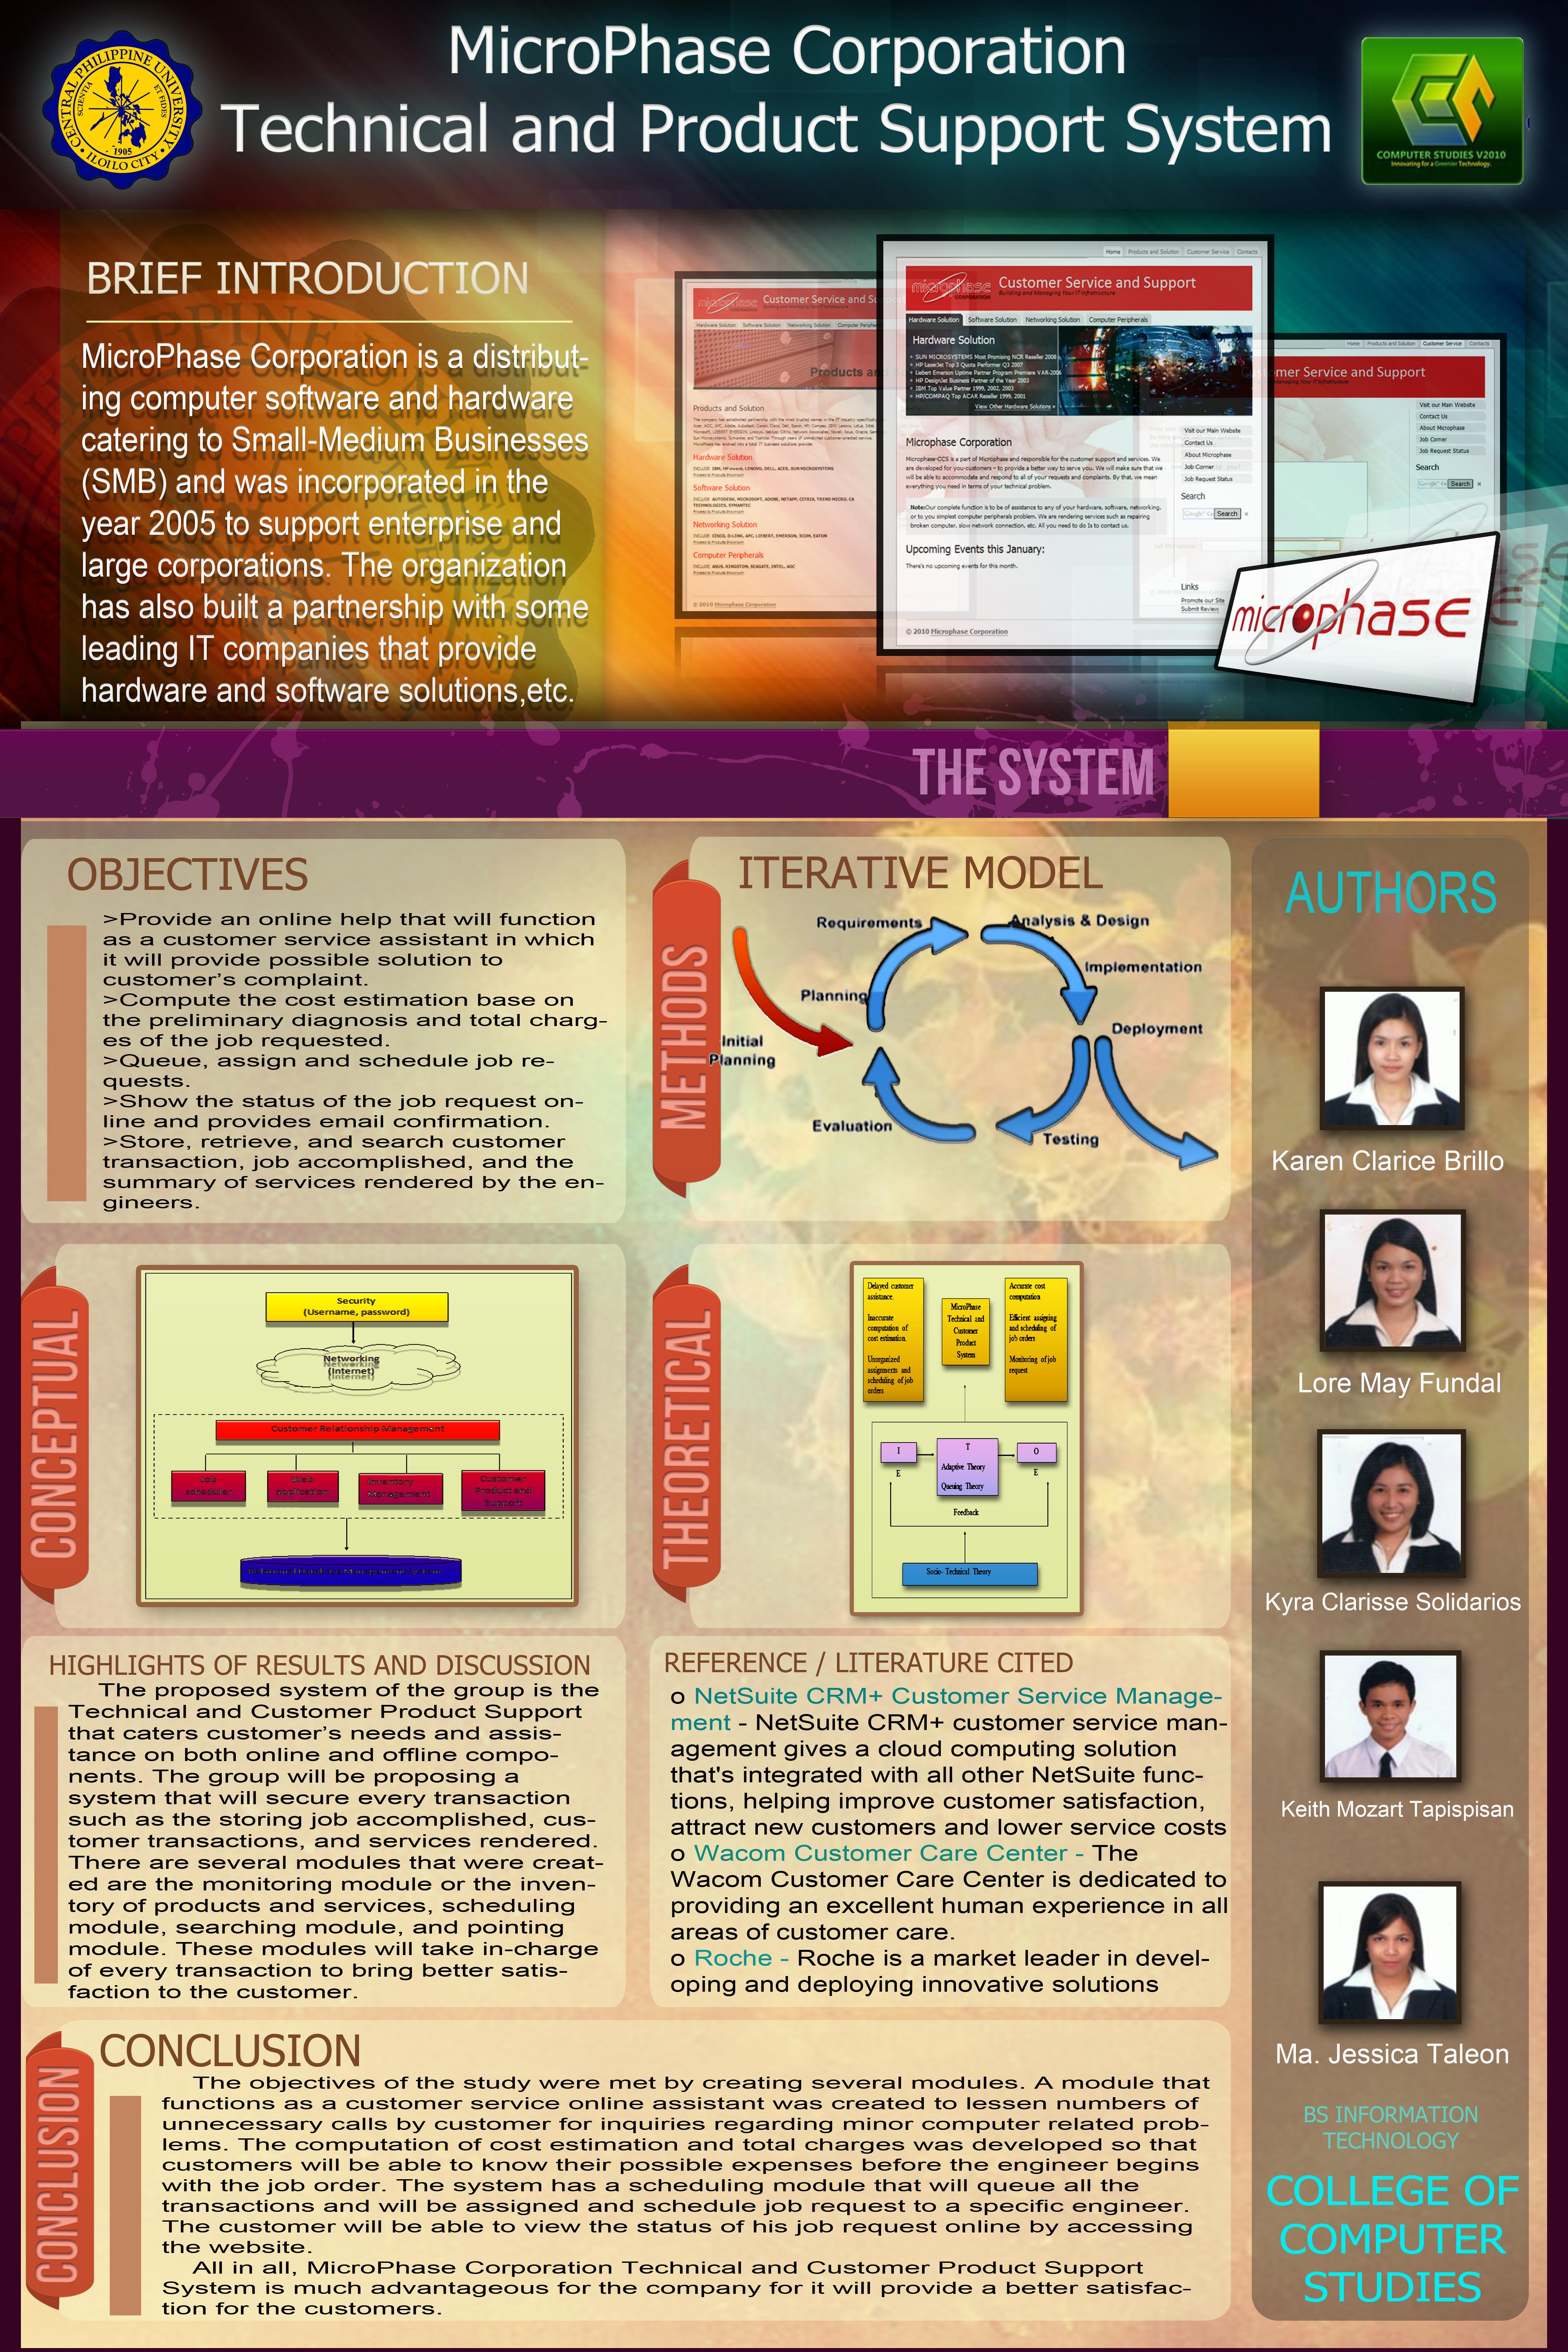 thesis tarpaulin layout